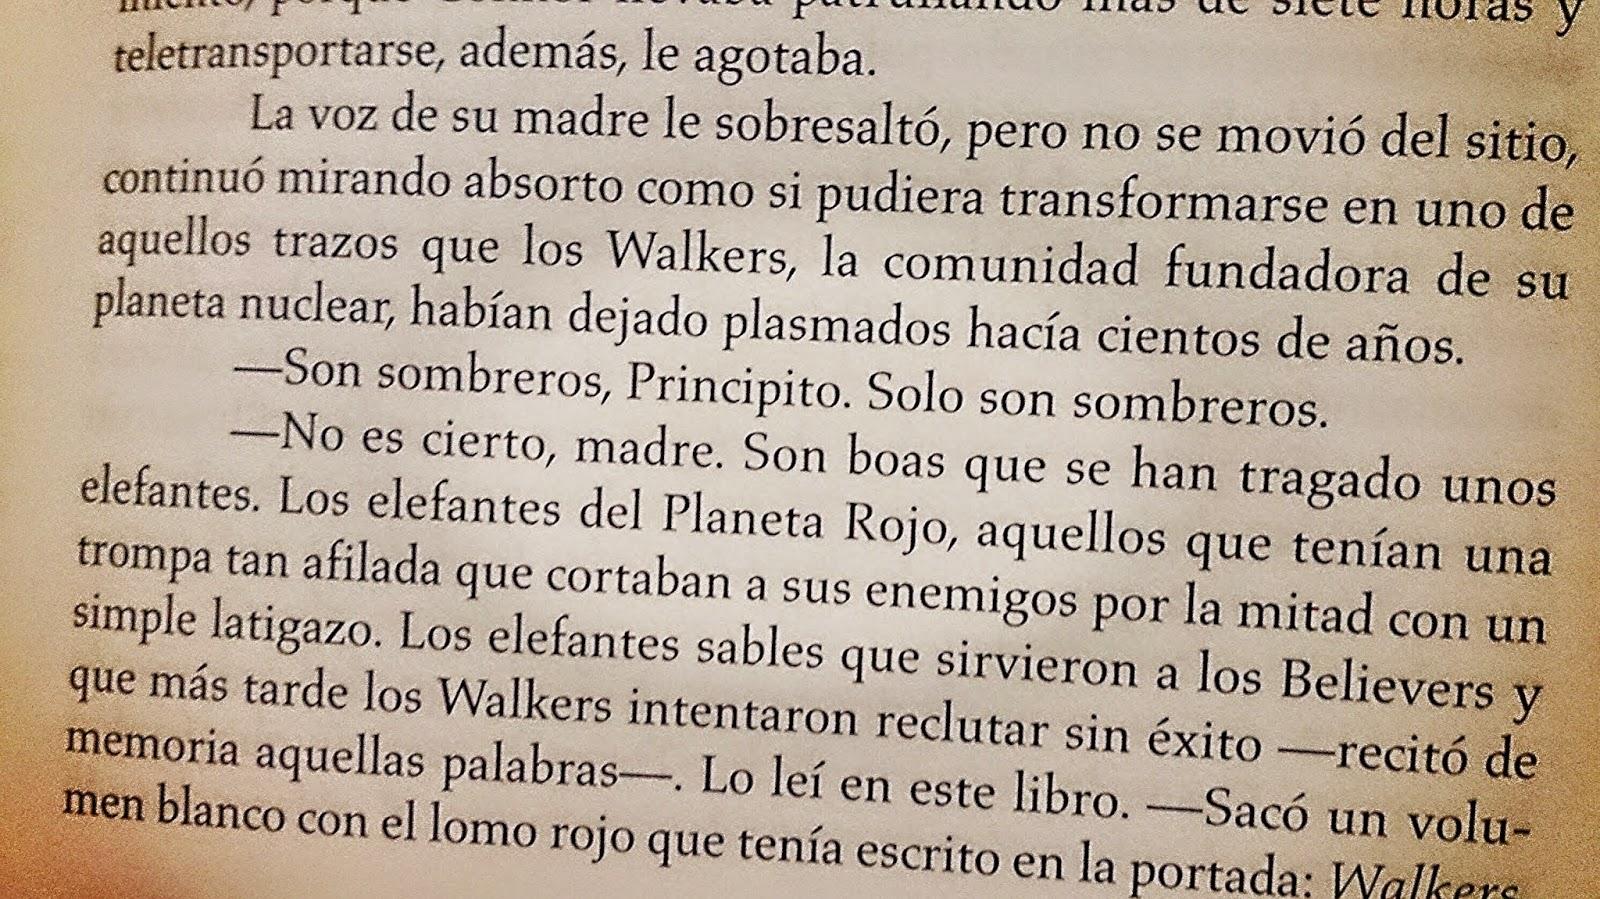 Fragmento de Principito debe morir de Carmen Moreno. Literatura ciencia ficción.